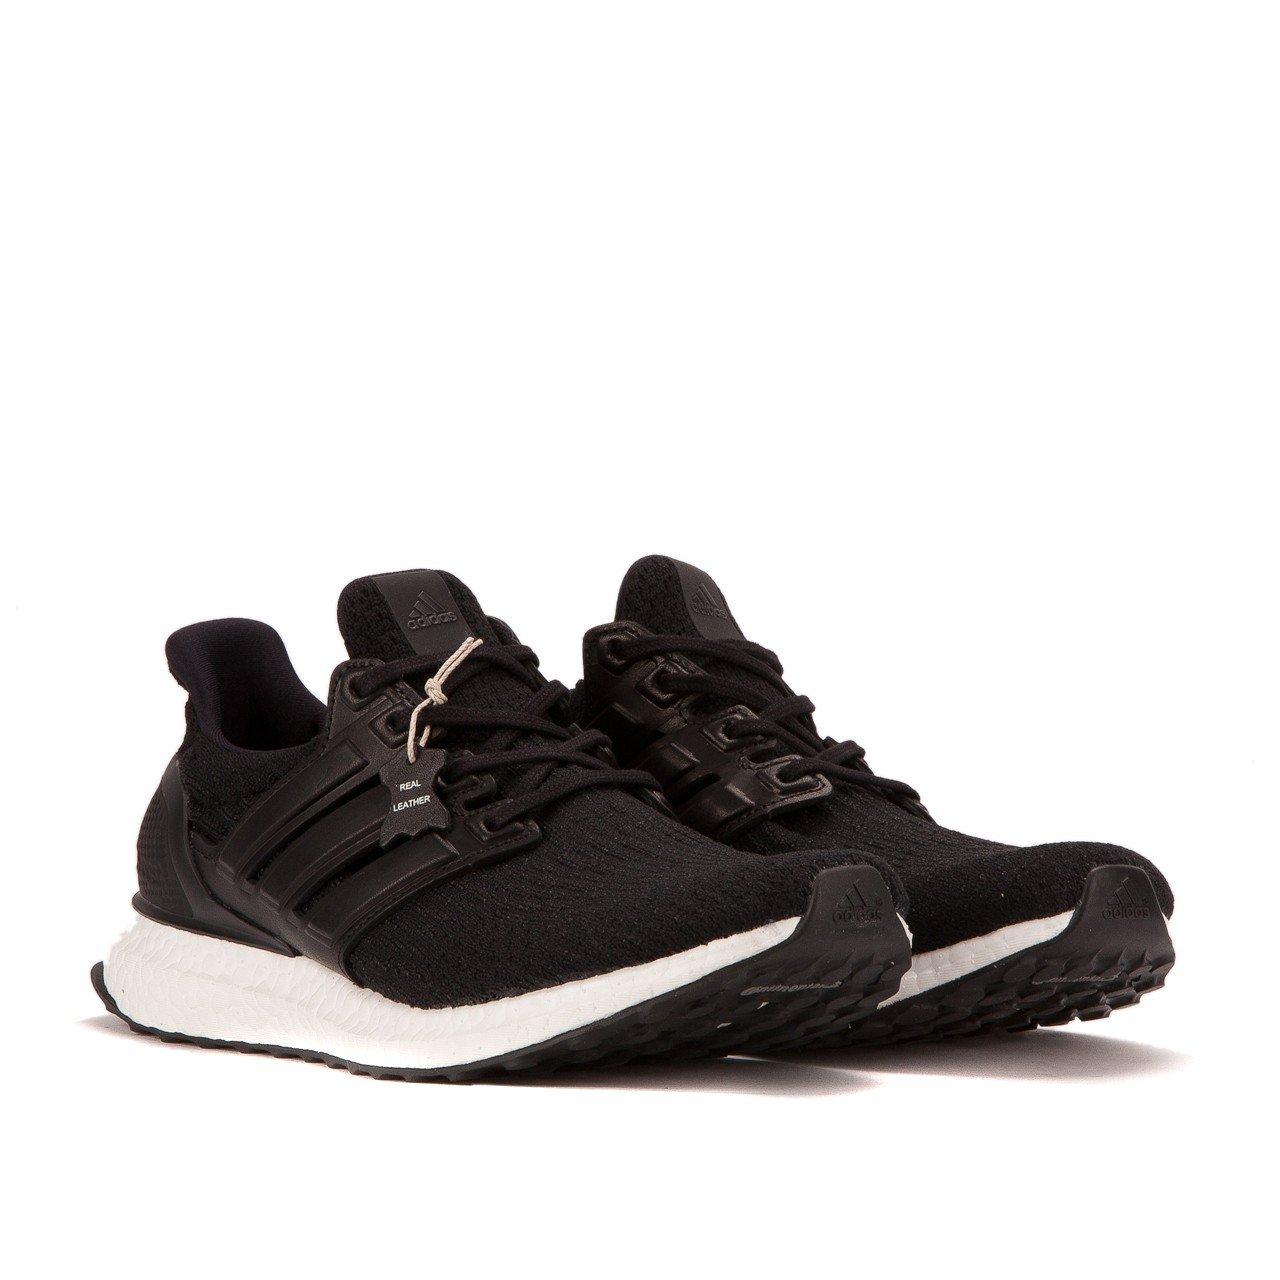 Black Black Adidas Men's Ultraboost Ltd Running shoes